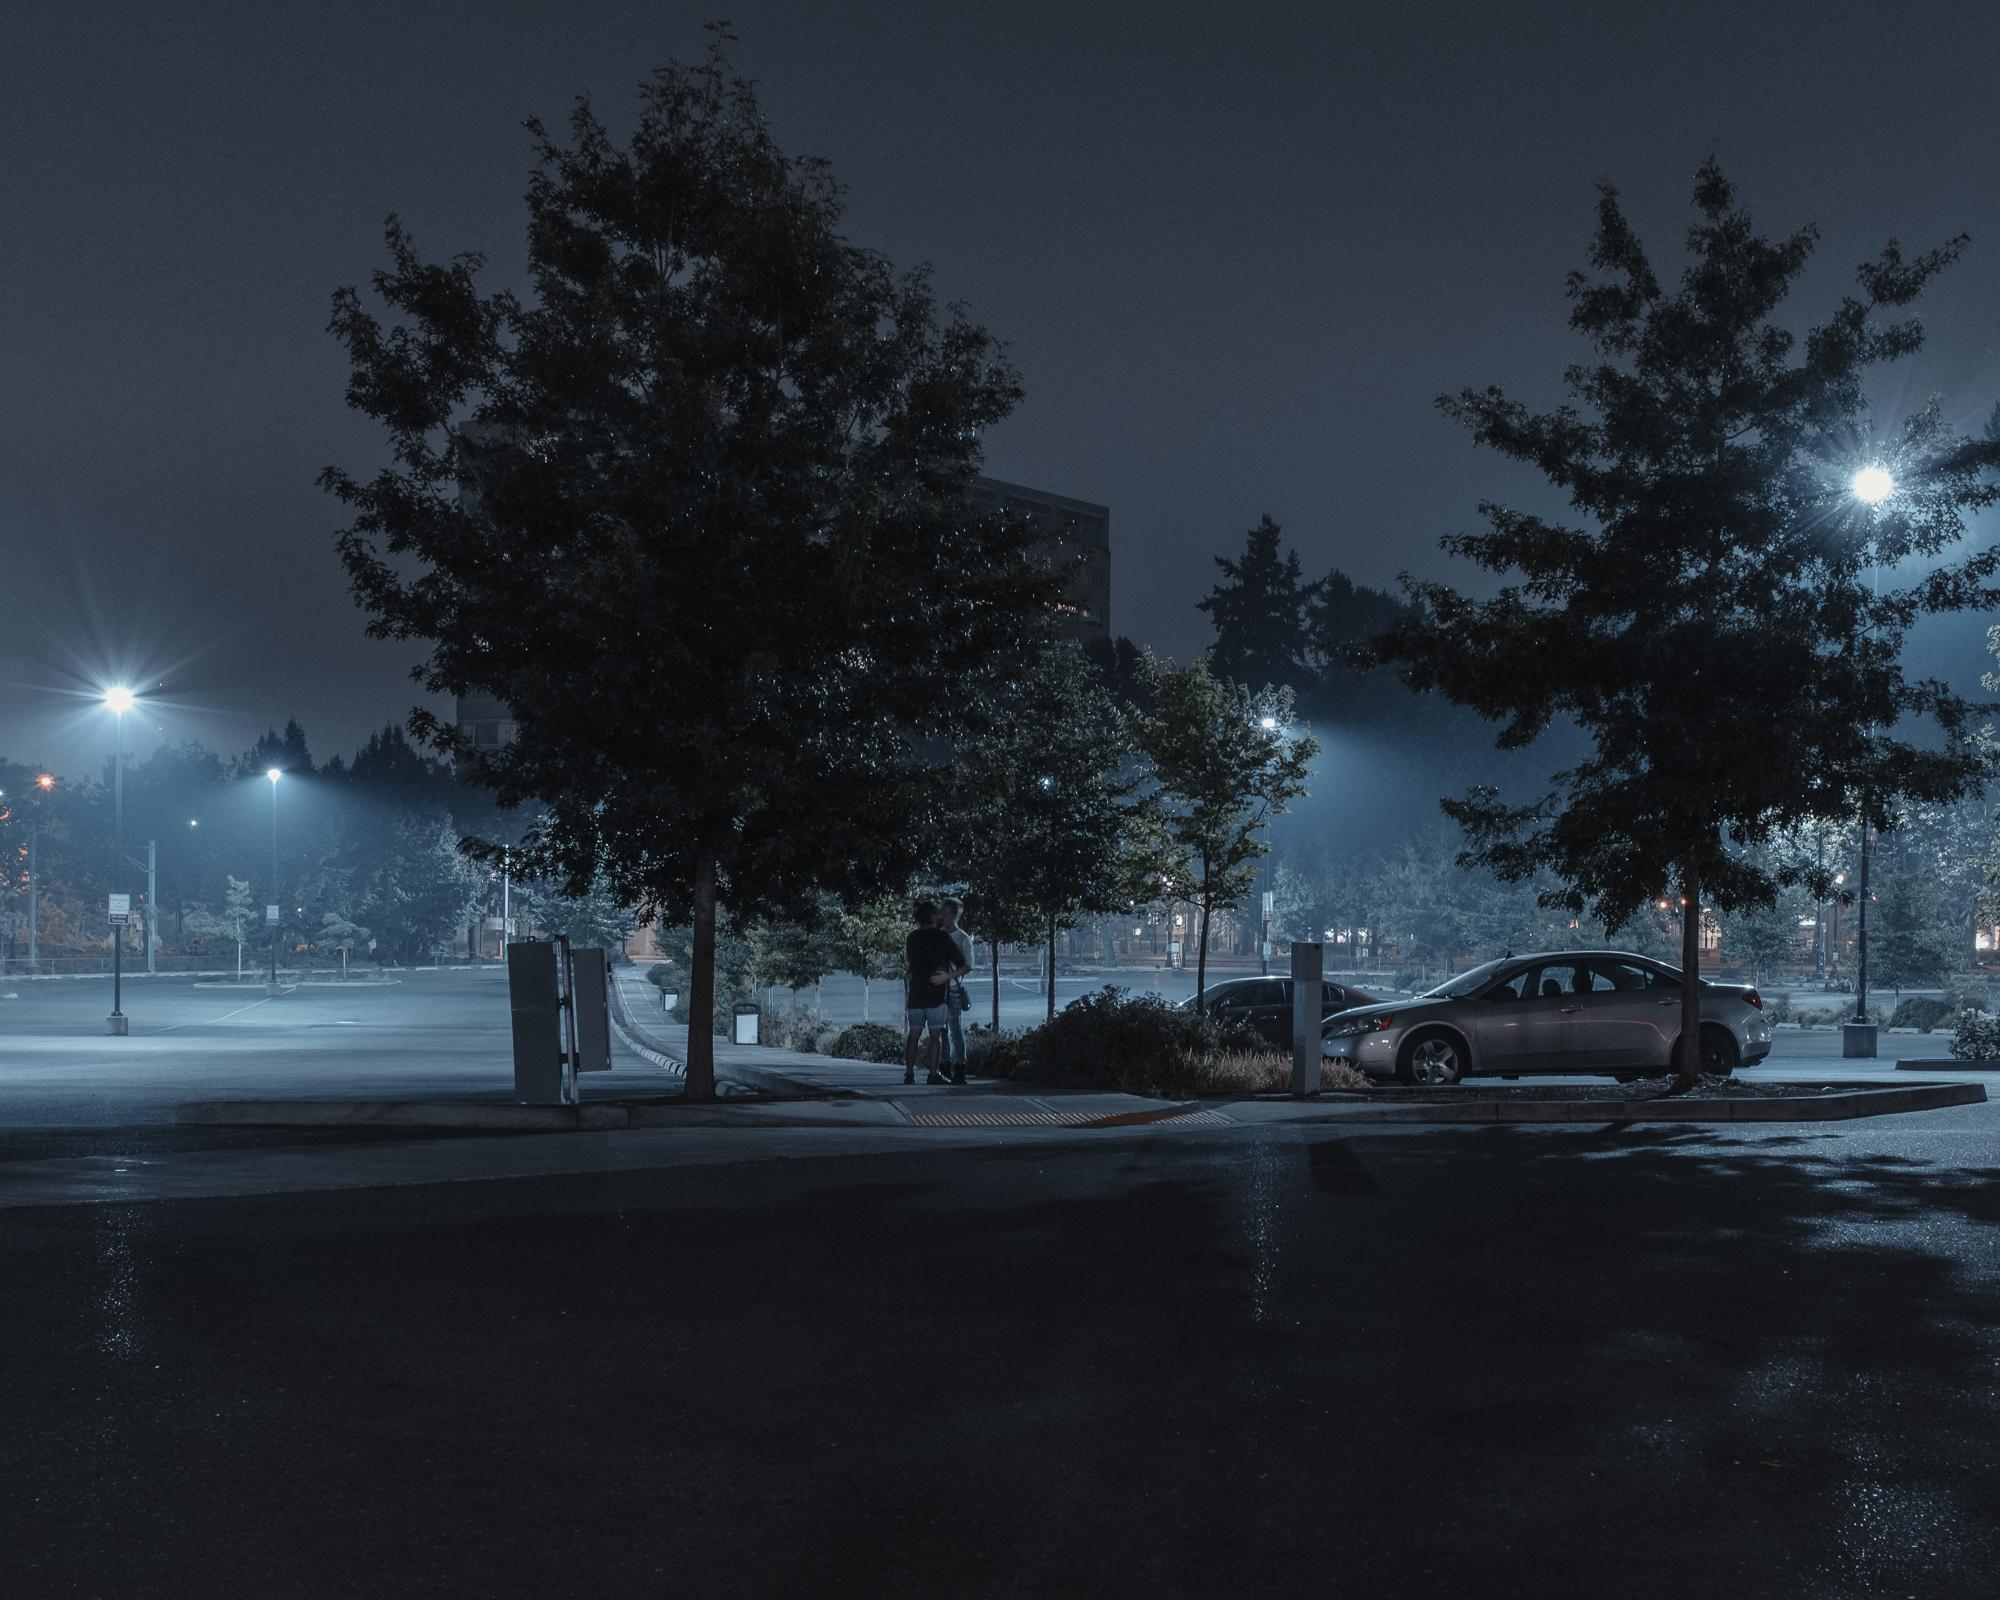 Nights-46.jpg